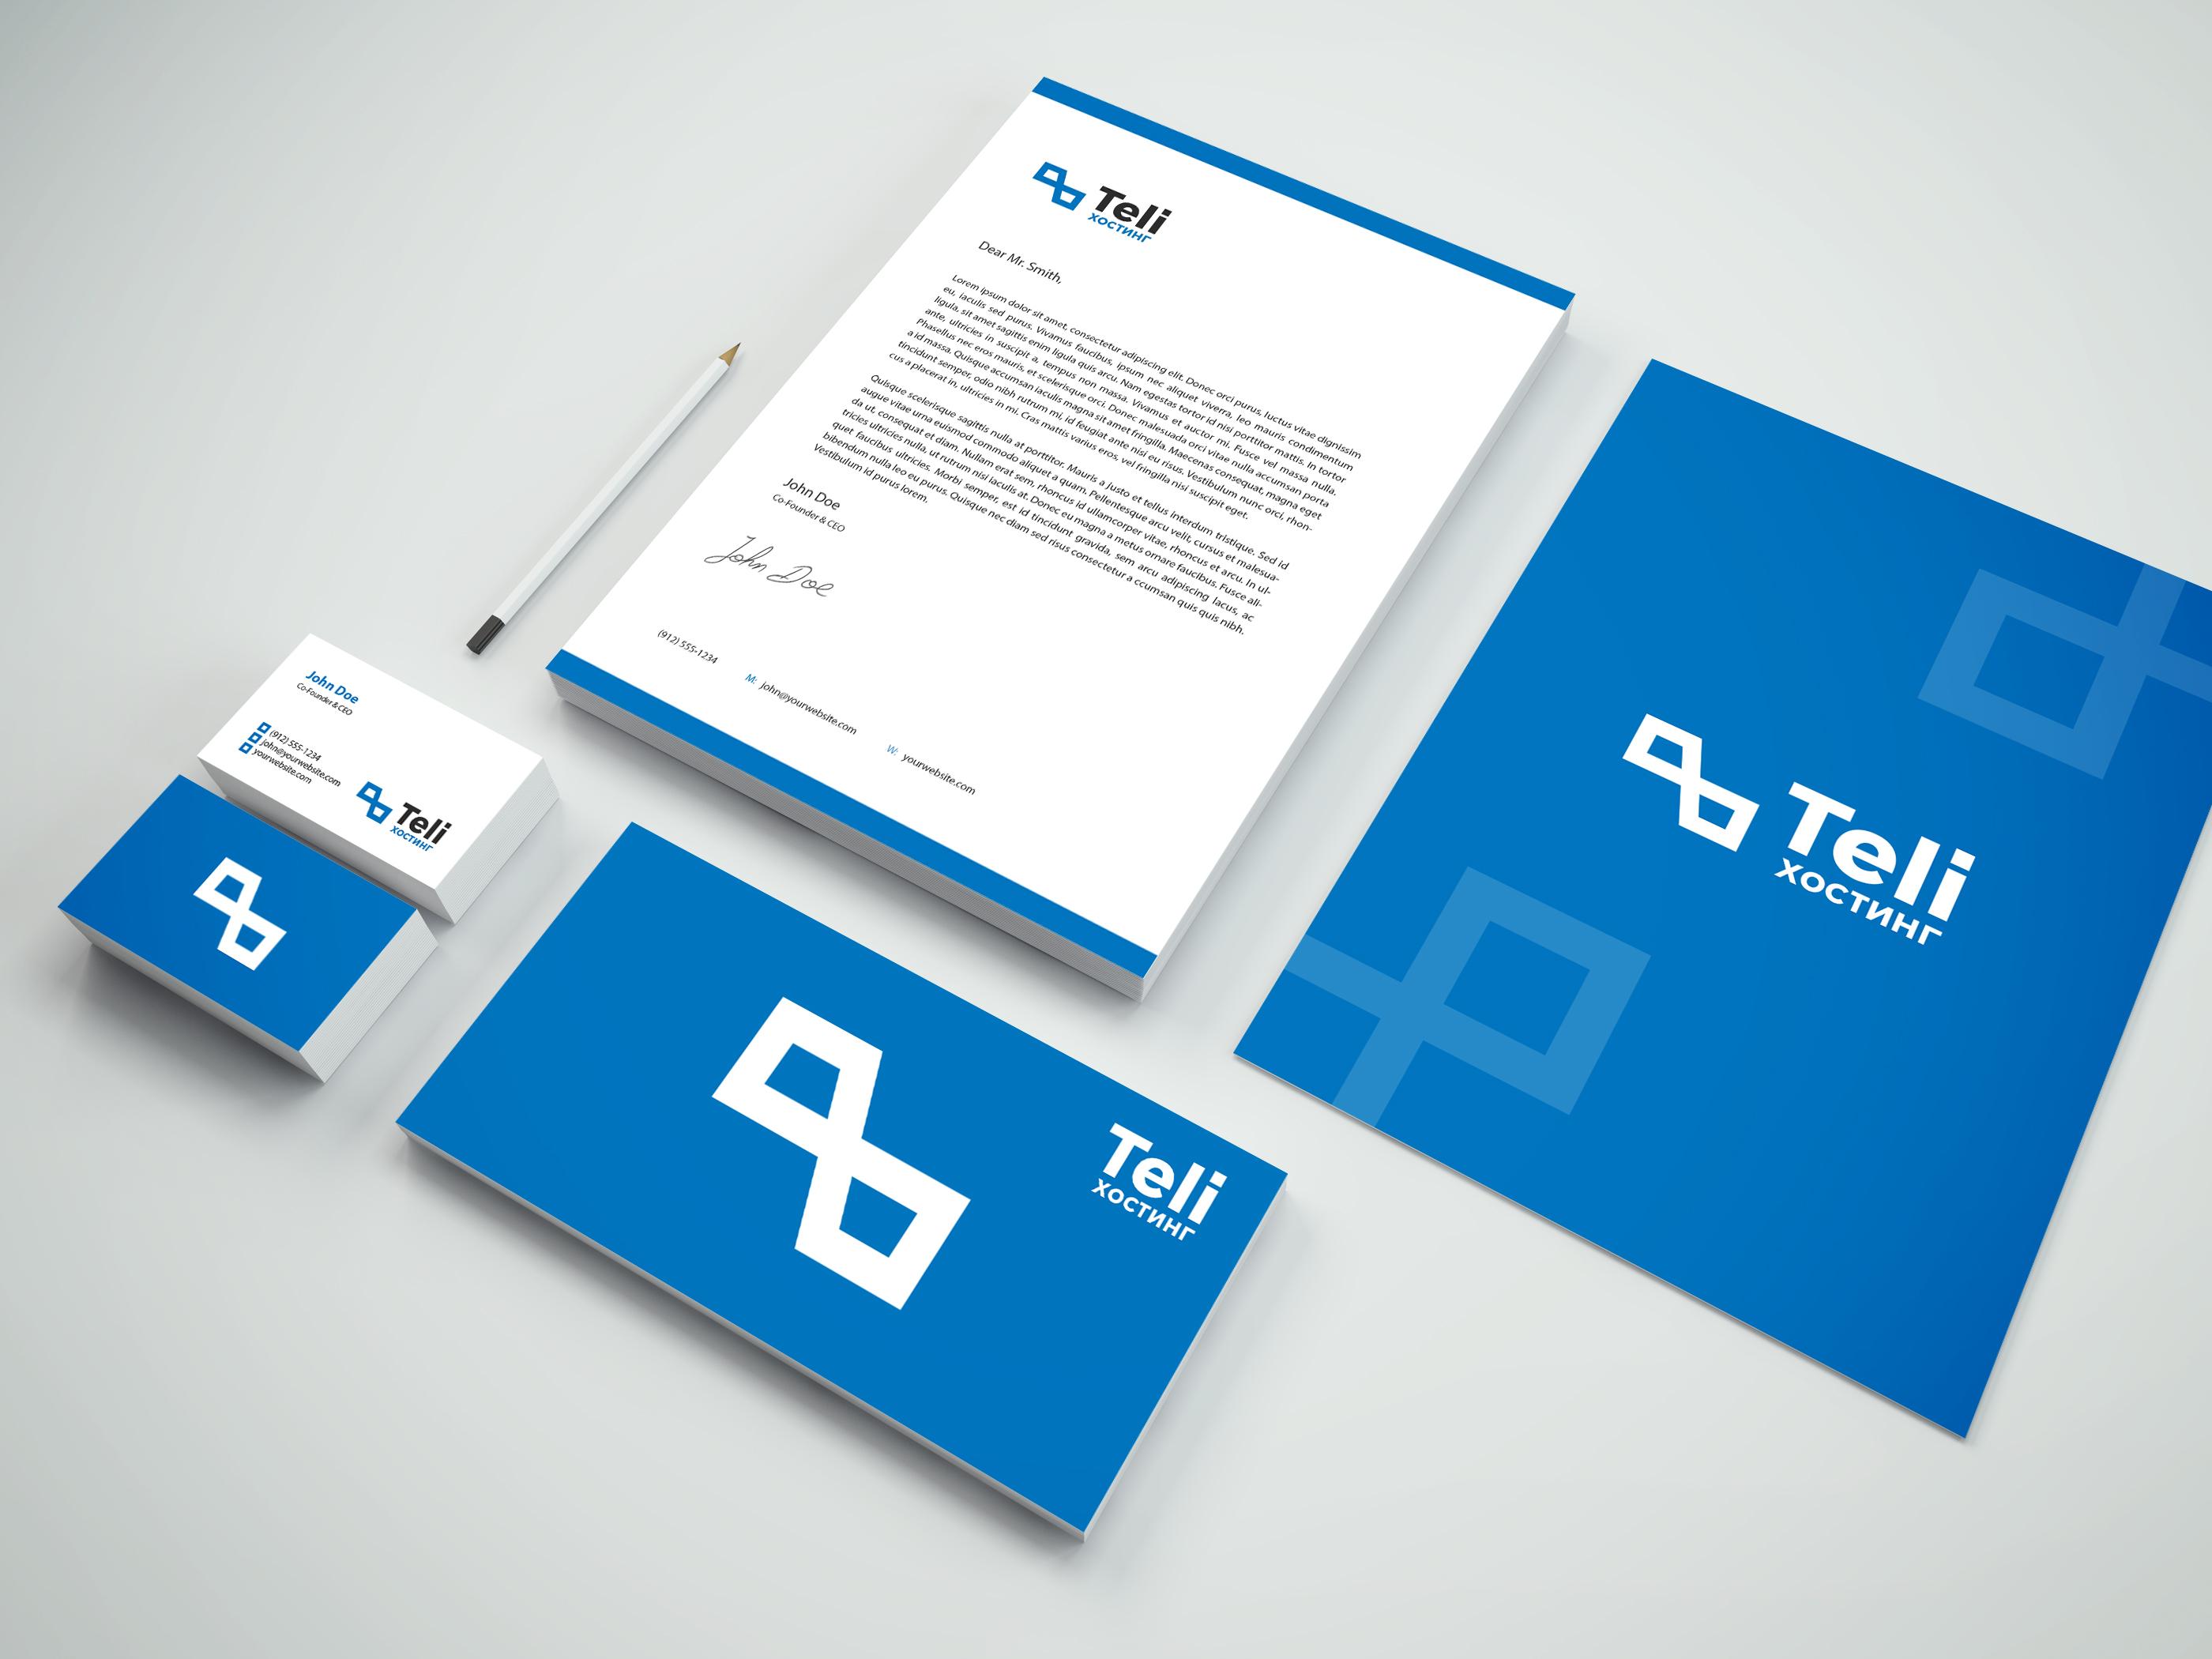 Разработка логотипа и фирменного стиля фото f_7135902b56dbb021.jpg